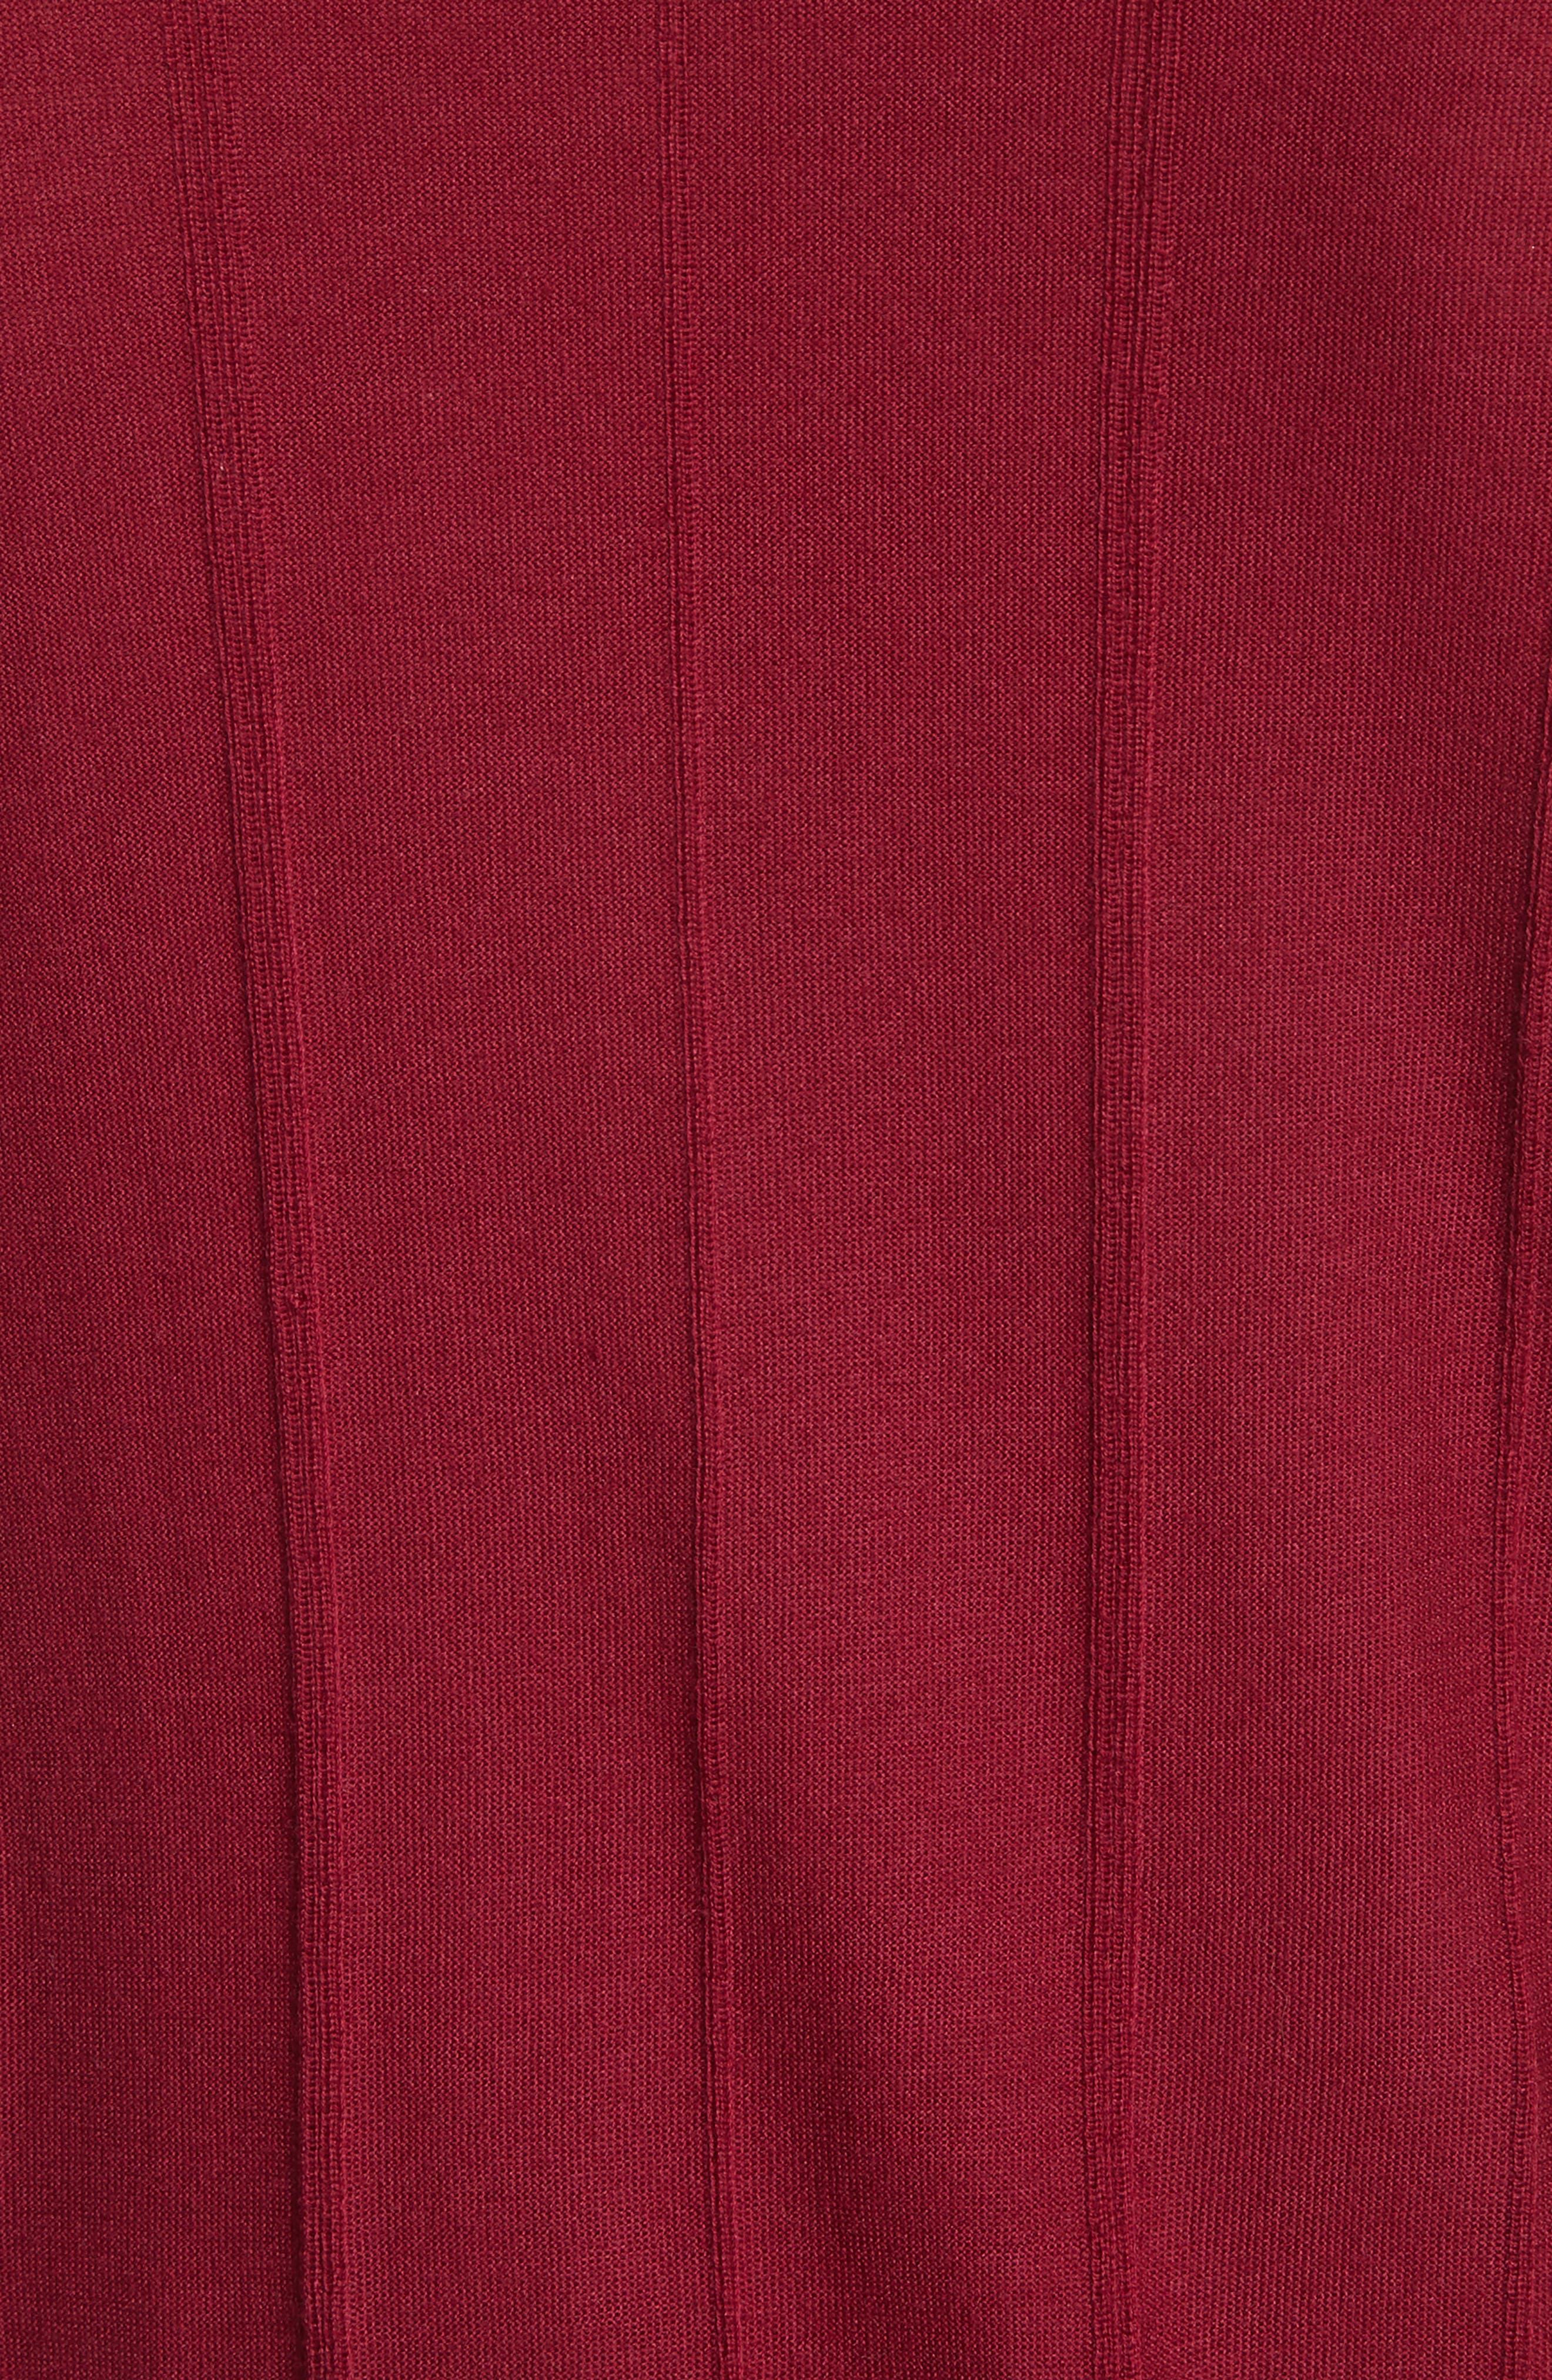 Slim Fit Wool Crewneck Sweater,                             Alternate thumbnail 5, color,                             930